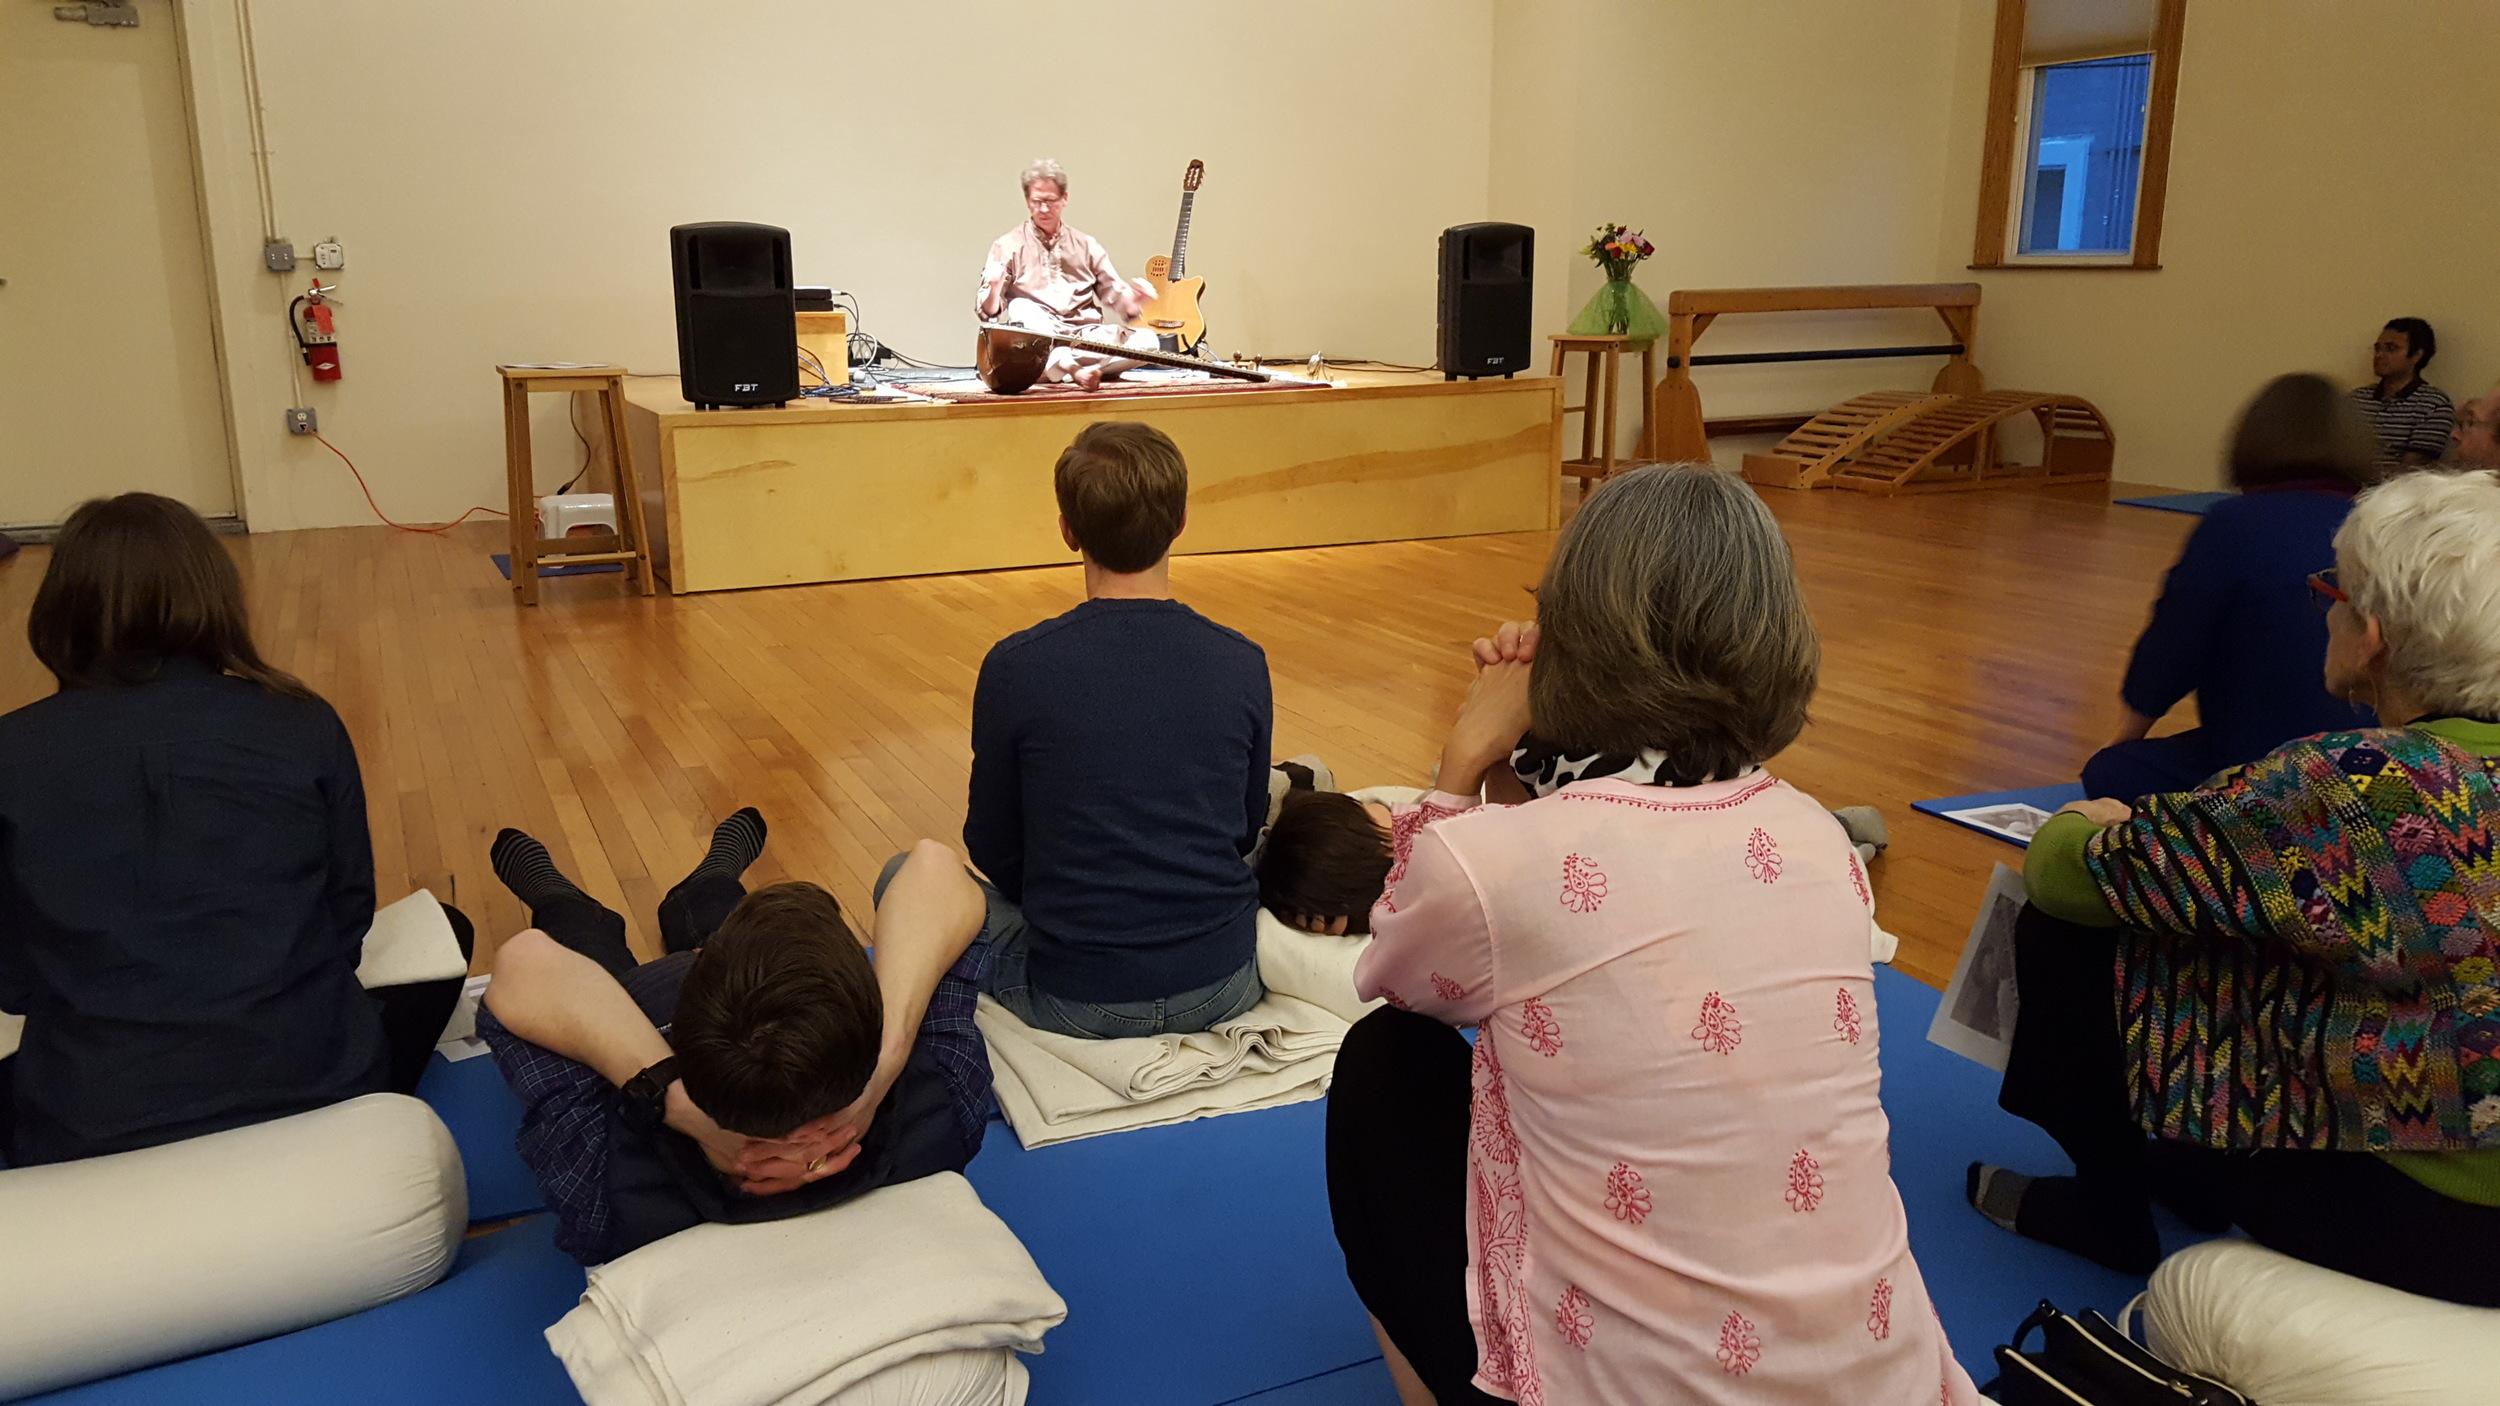 Ann Arbor School of Yoga - April 30, 2016 (Photo by Grace Chung)